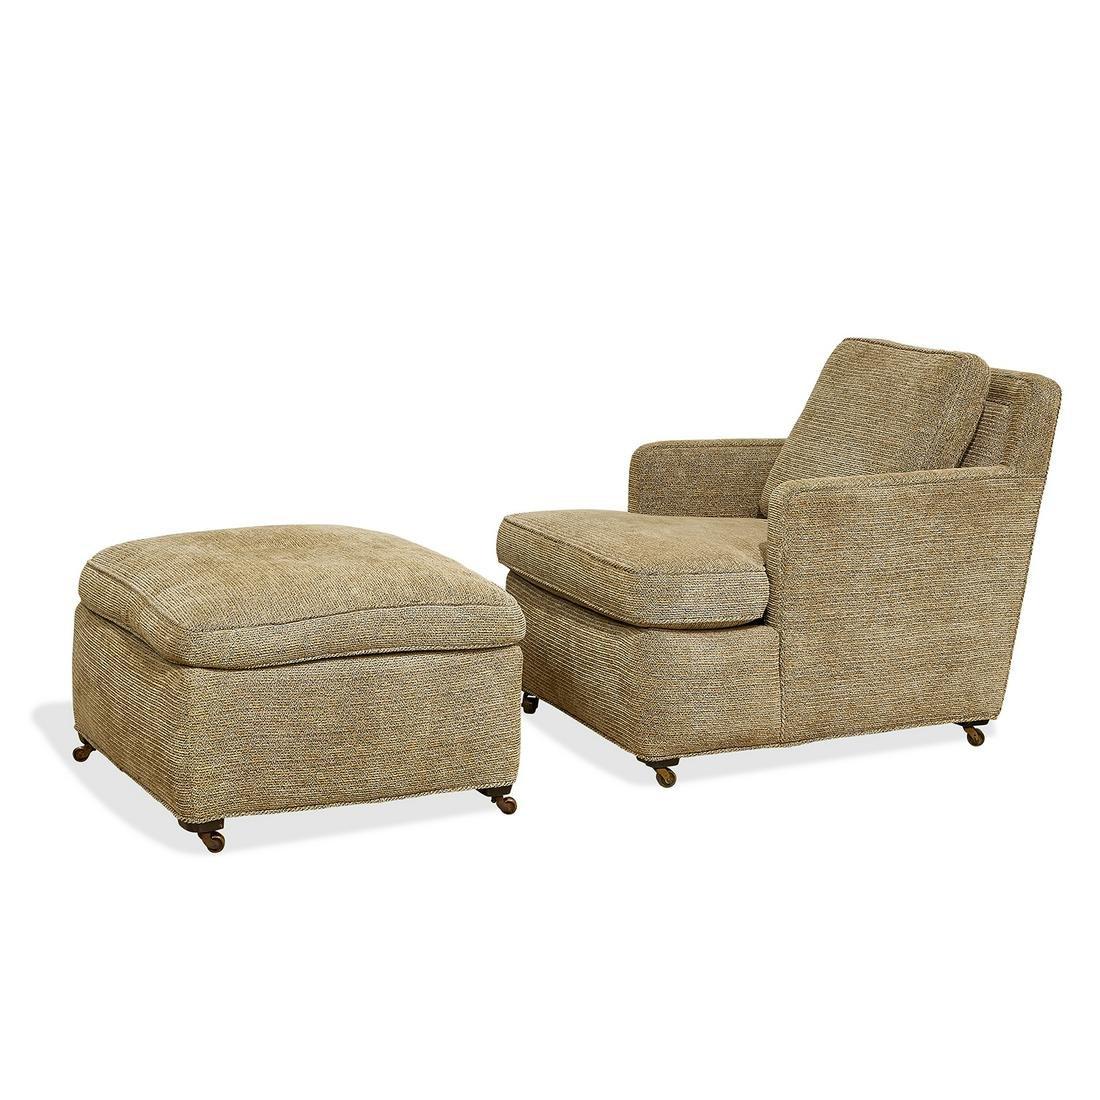 Edward Wormley for Dunbar lounge chair & ottoman